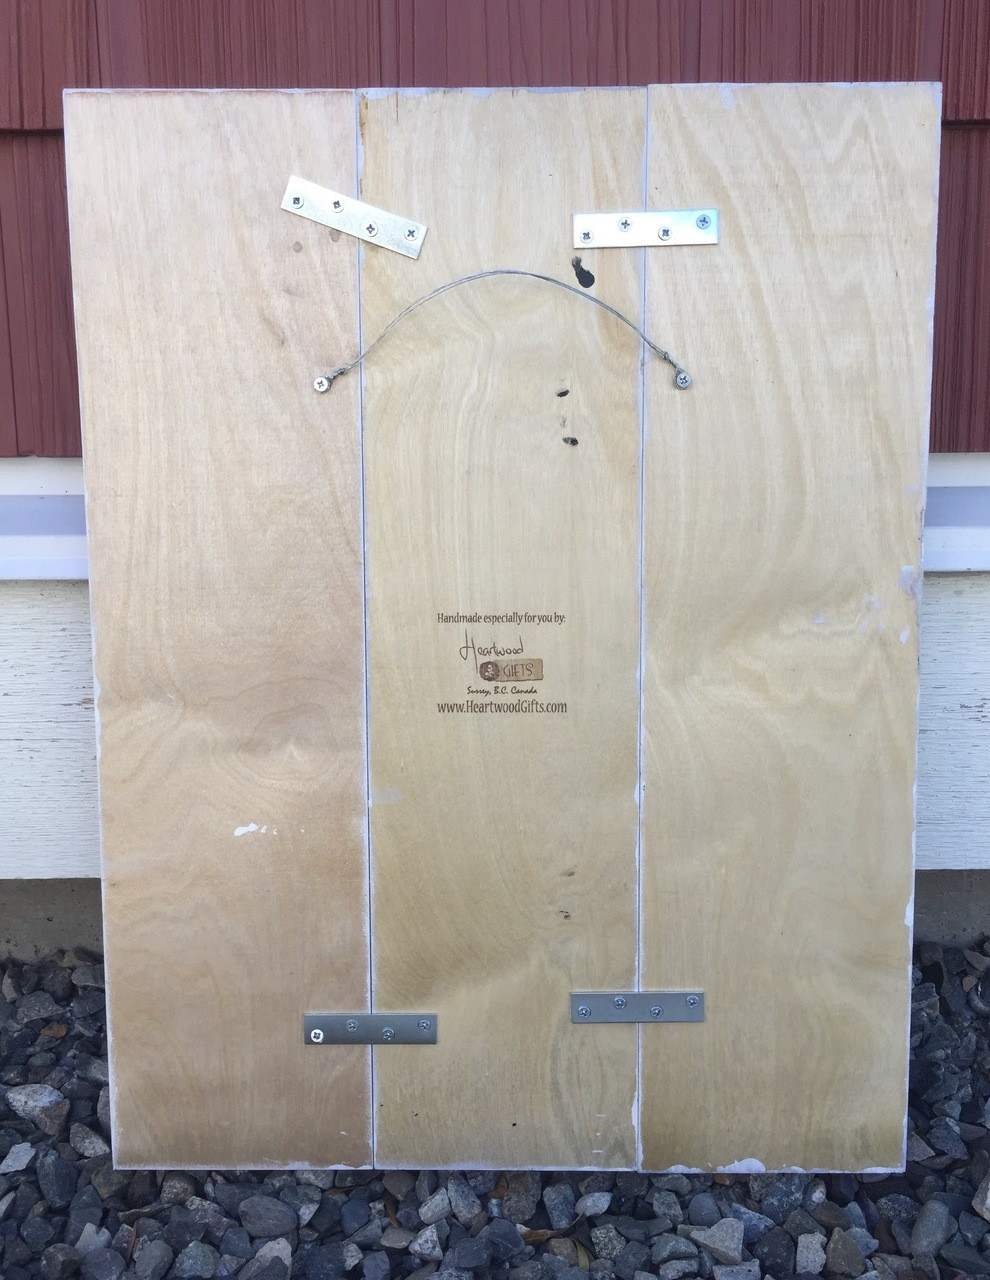 Rear view of muti board sign